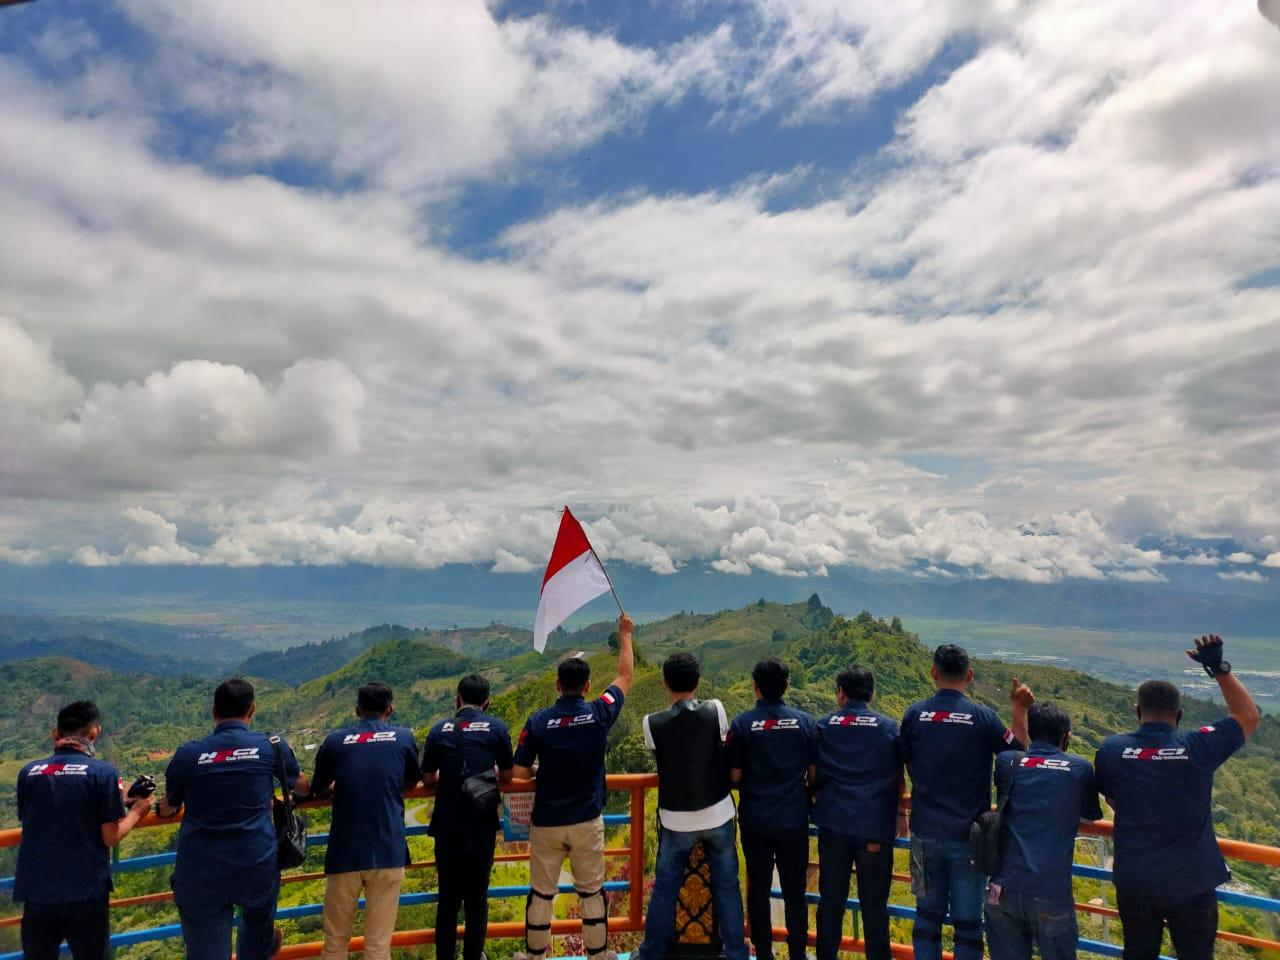 HPCI Chapter Jambi Mantapkan Deklarasi di Negeri Sakti Alam Kerinci